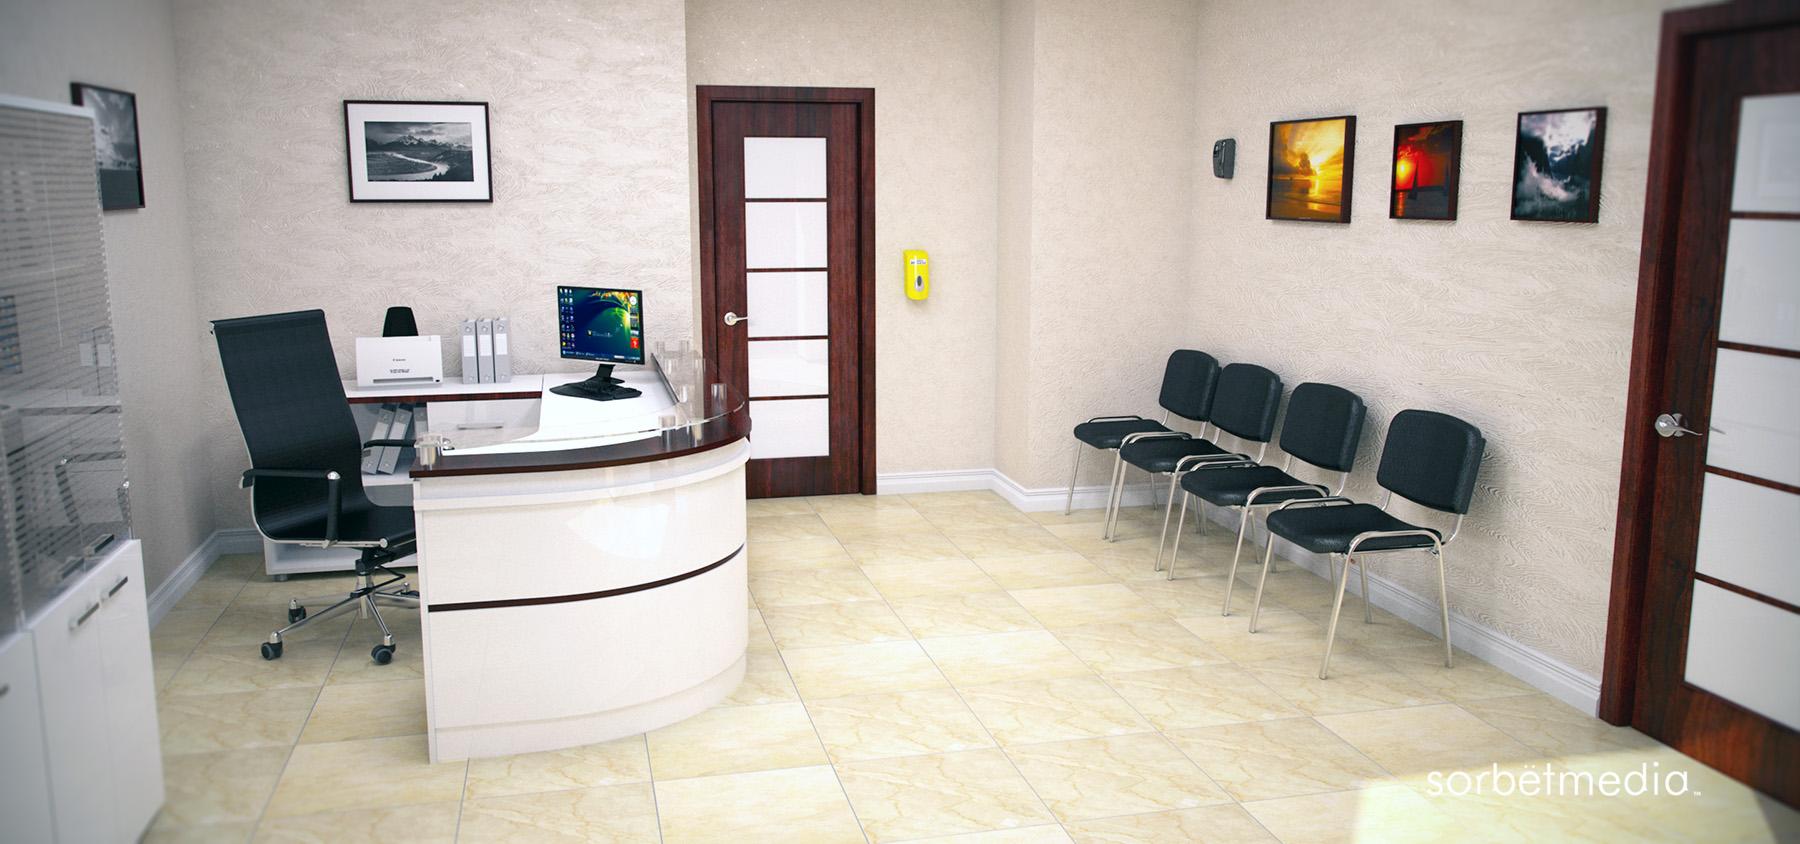 3D Surgery Reception Concept Visual